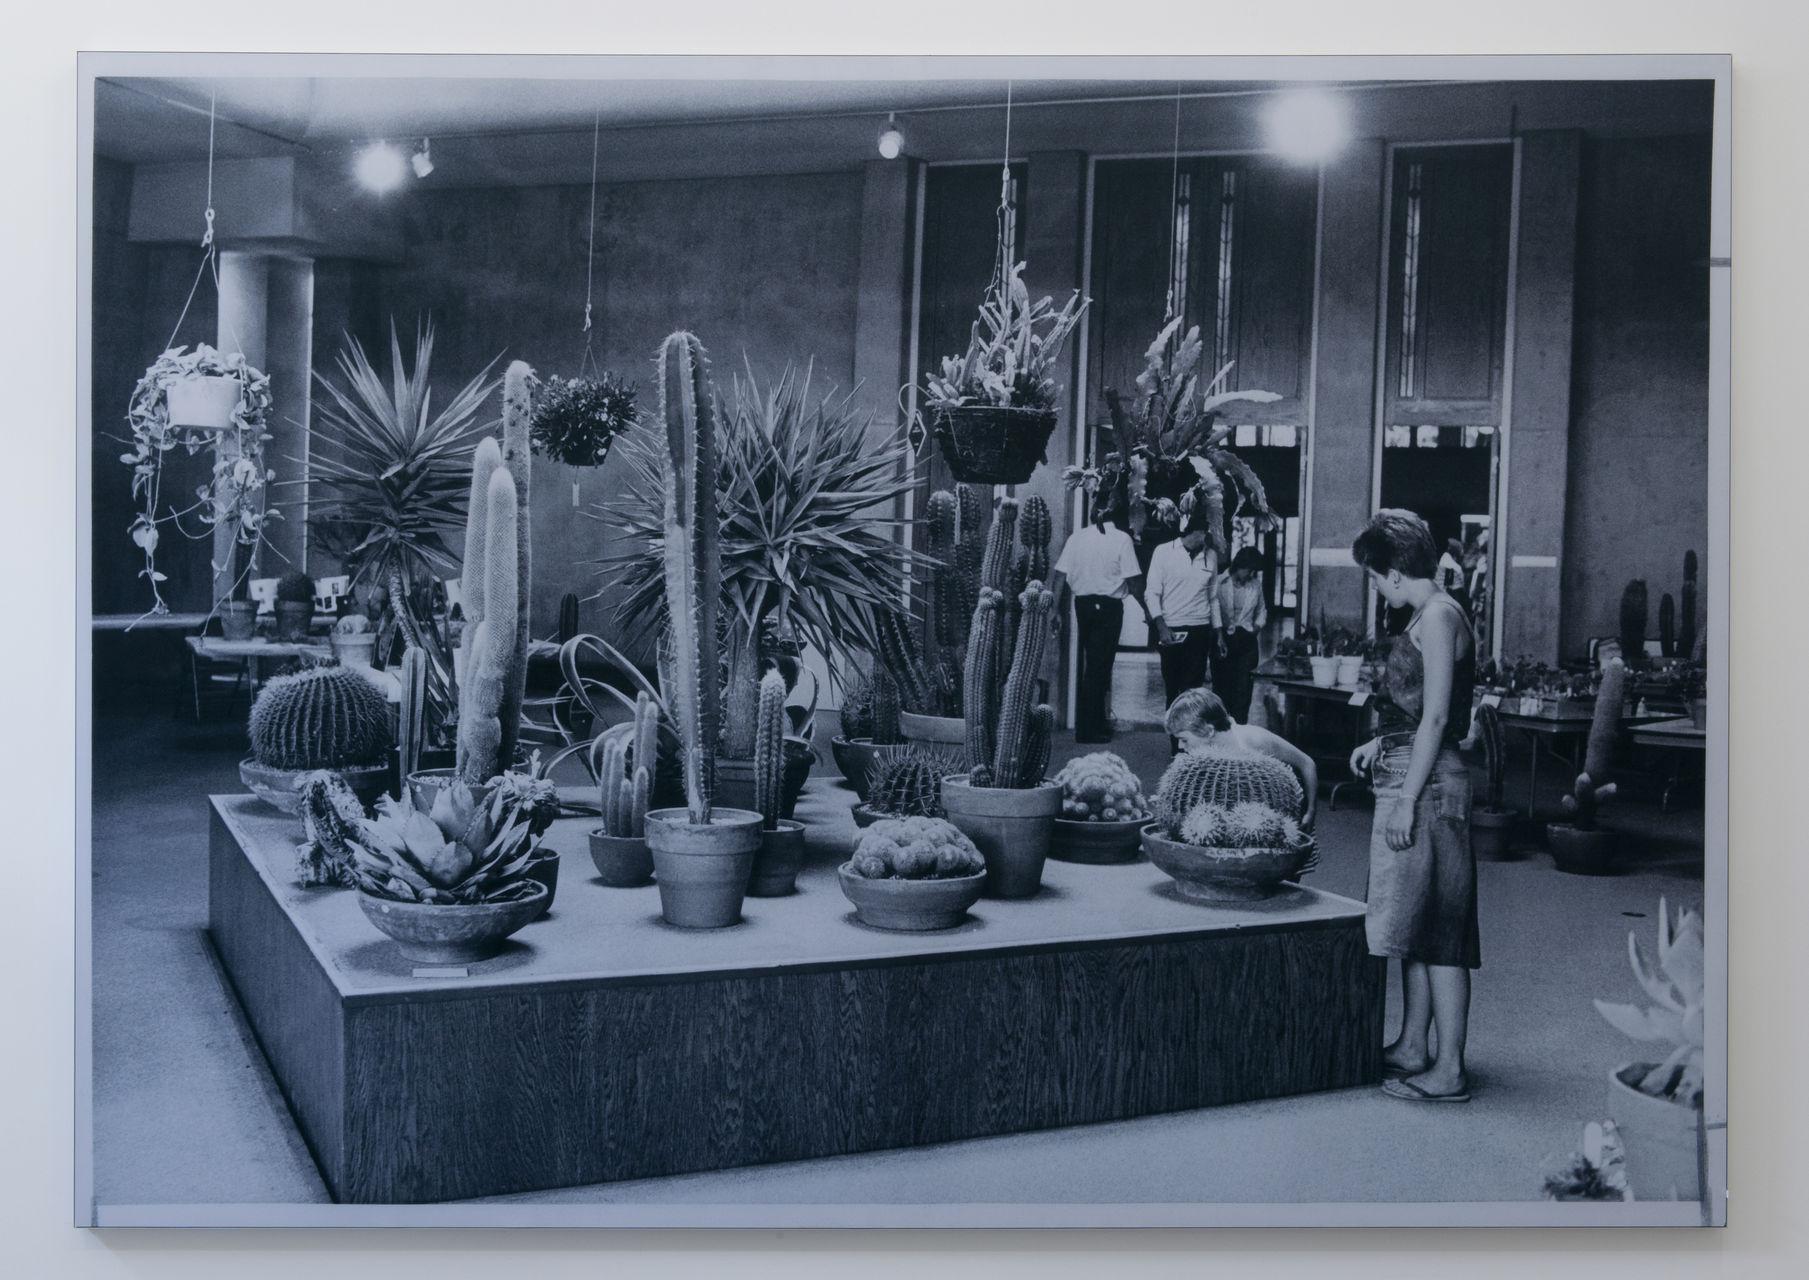 Serandour-Yann-Cactus_Show__Sale_2014